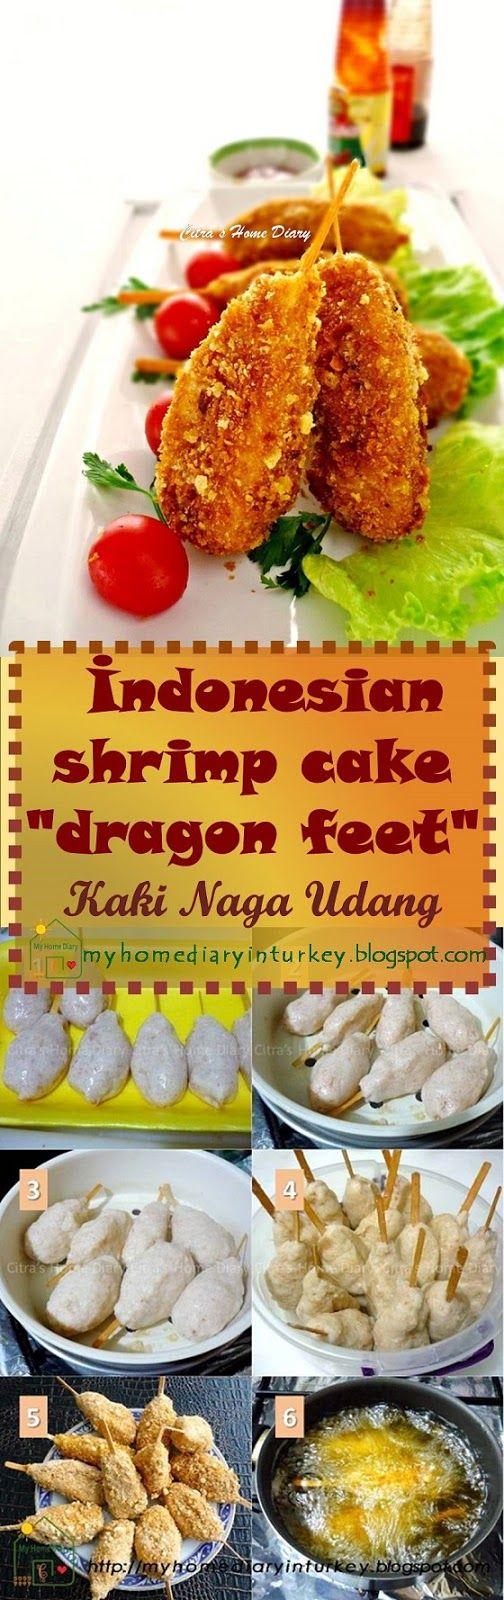 "Kaki Naga Udang / İndonesian shrimp cake ""dragon feet"". #kakinaga #udang #snack #shrimp #seafood #chicken #Indonesianfood #nugget #kidsmeal #appetizer"